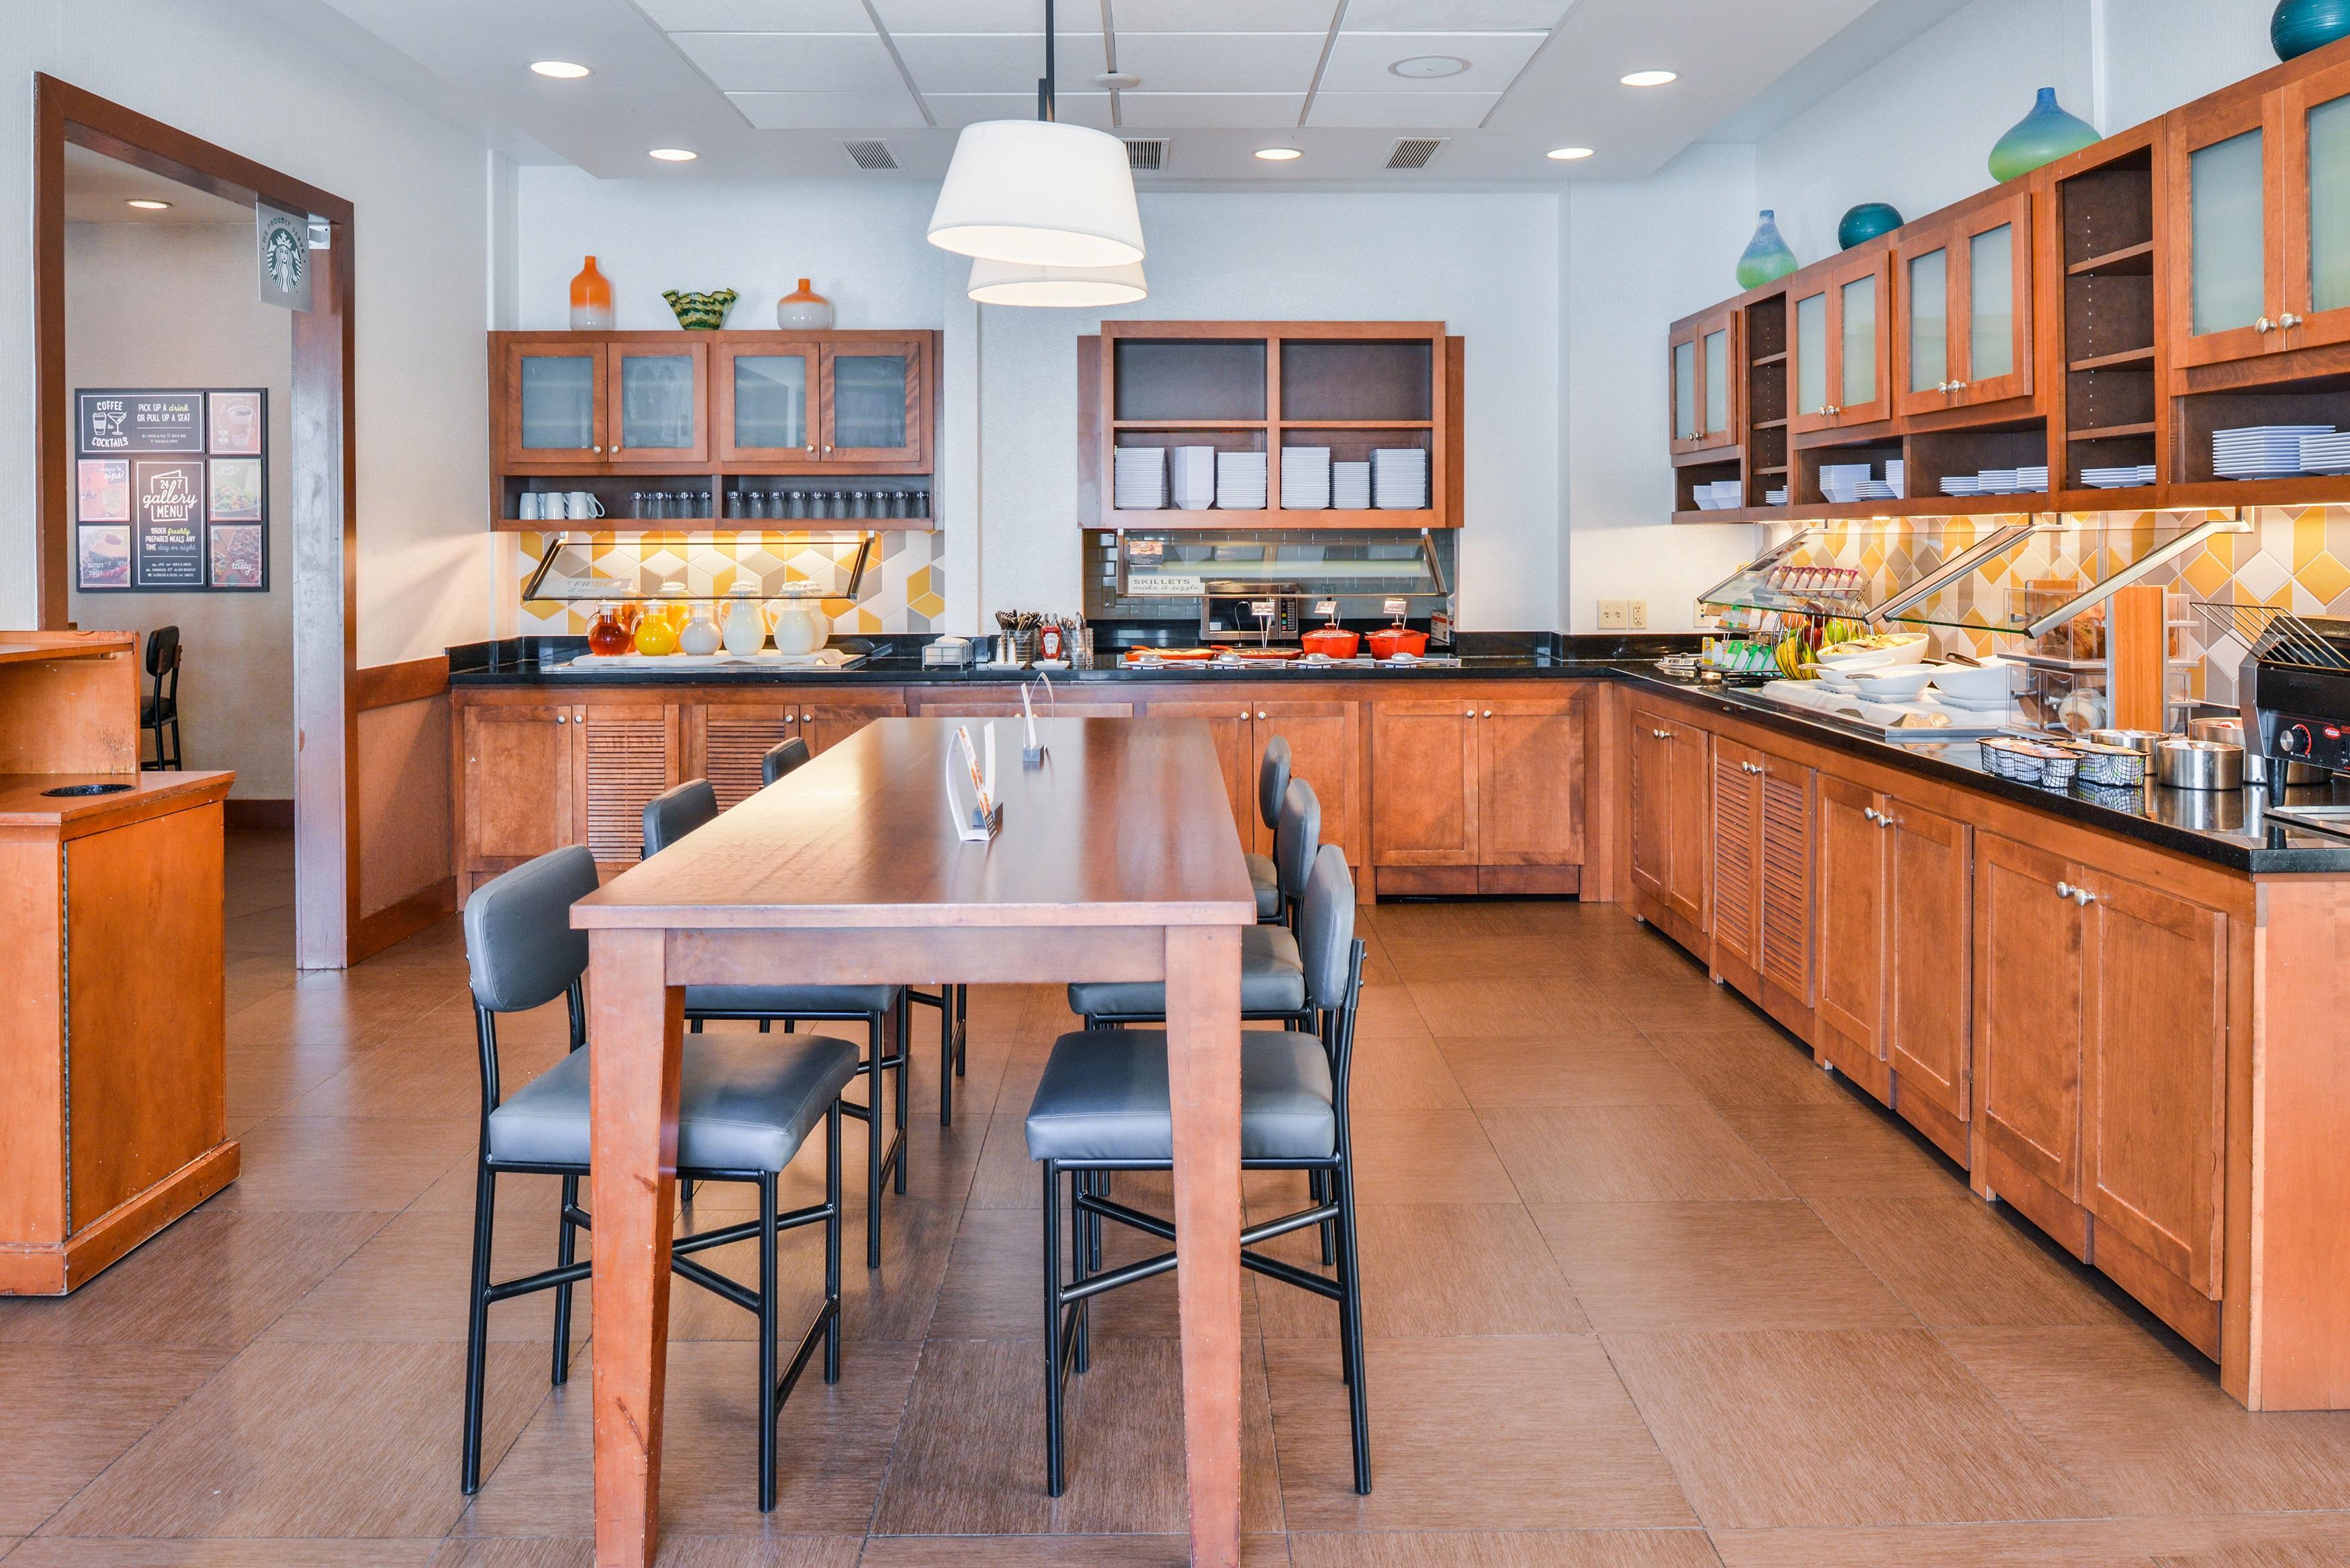 Hyatt Place Chesapeake/Greenbrier image 2